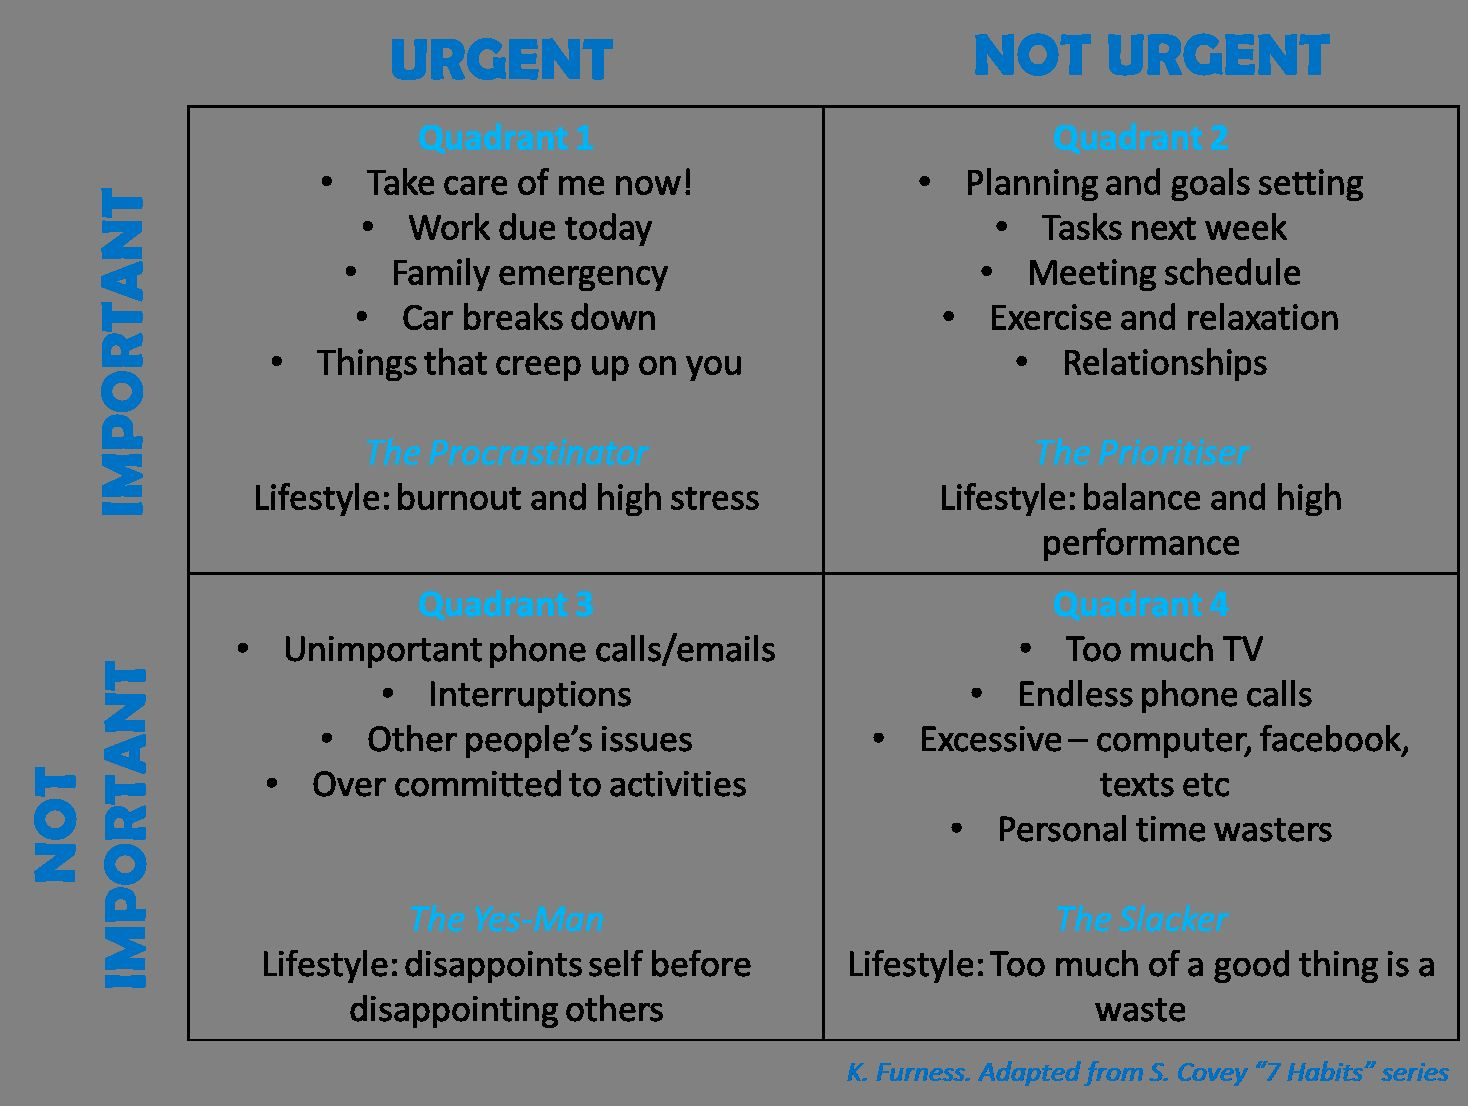 7 Habits Worksheet Pdf Lovely 7 Habits Highly Effective